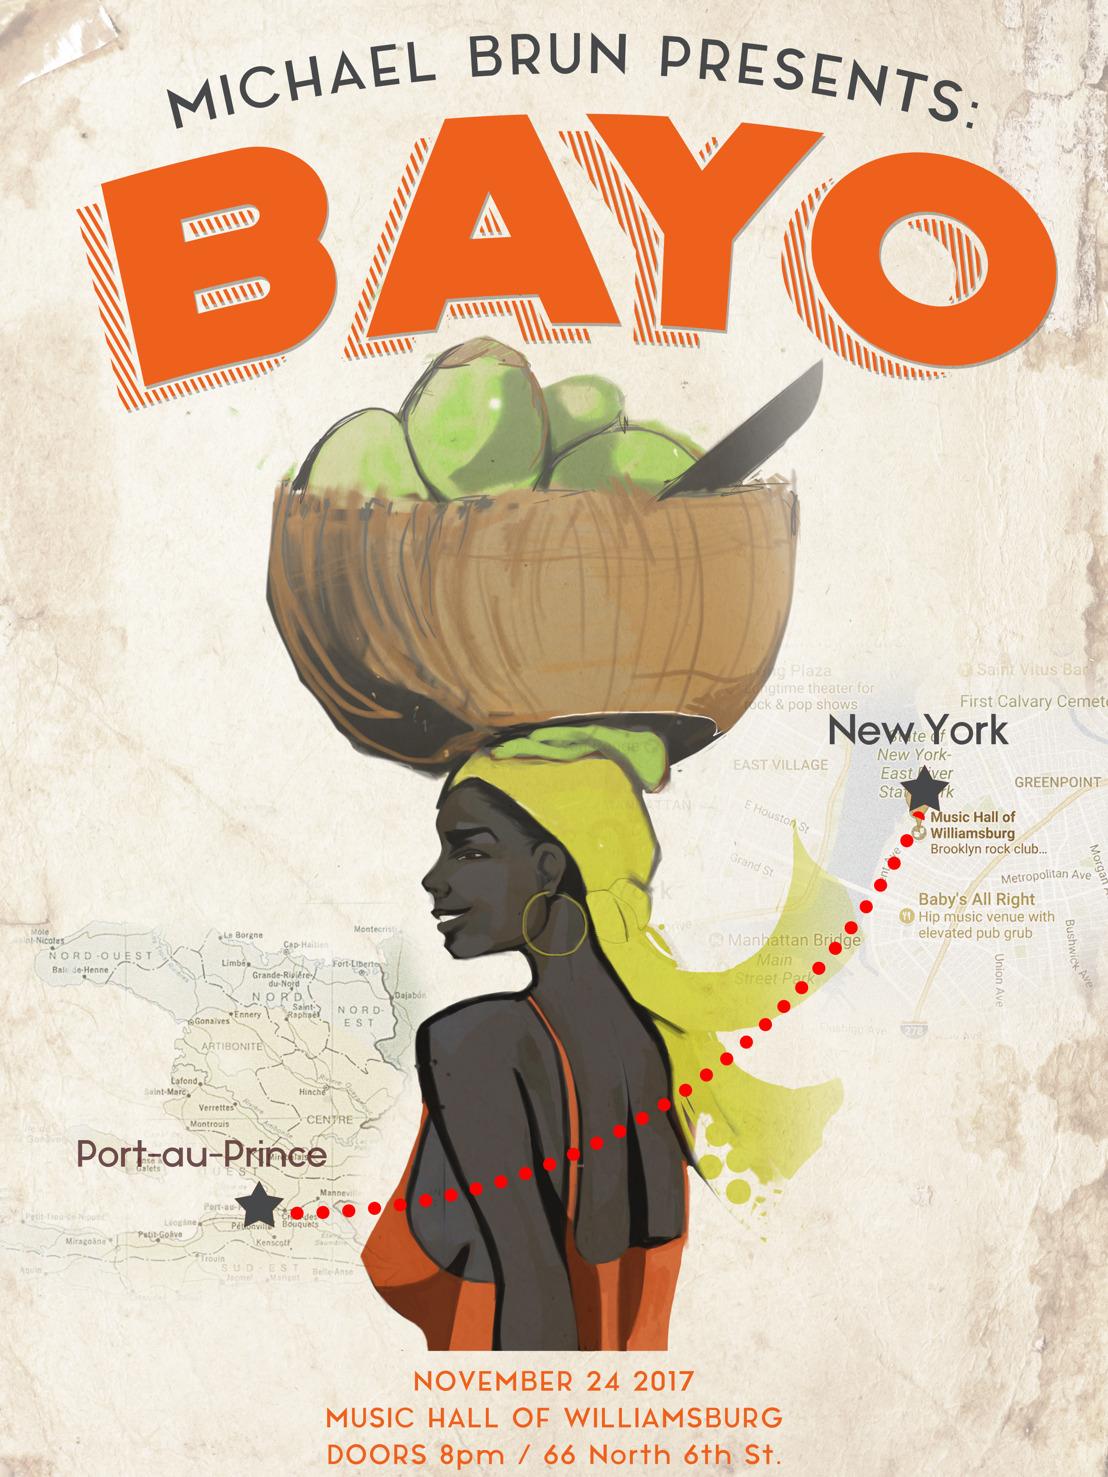 Michael Brun Presents Bayo - Music Hall of Williamsburg, New York City on 11/24